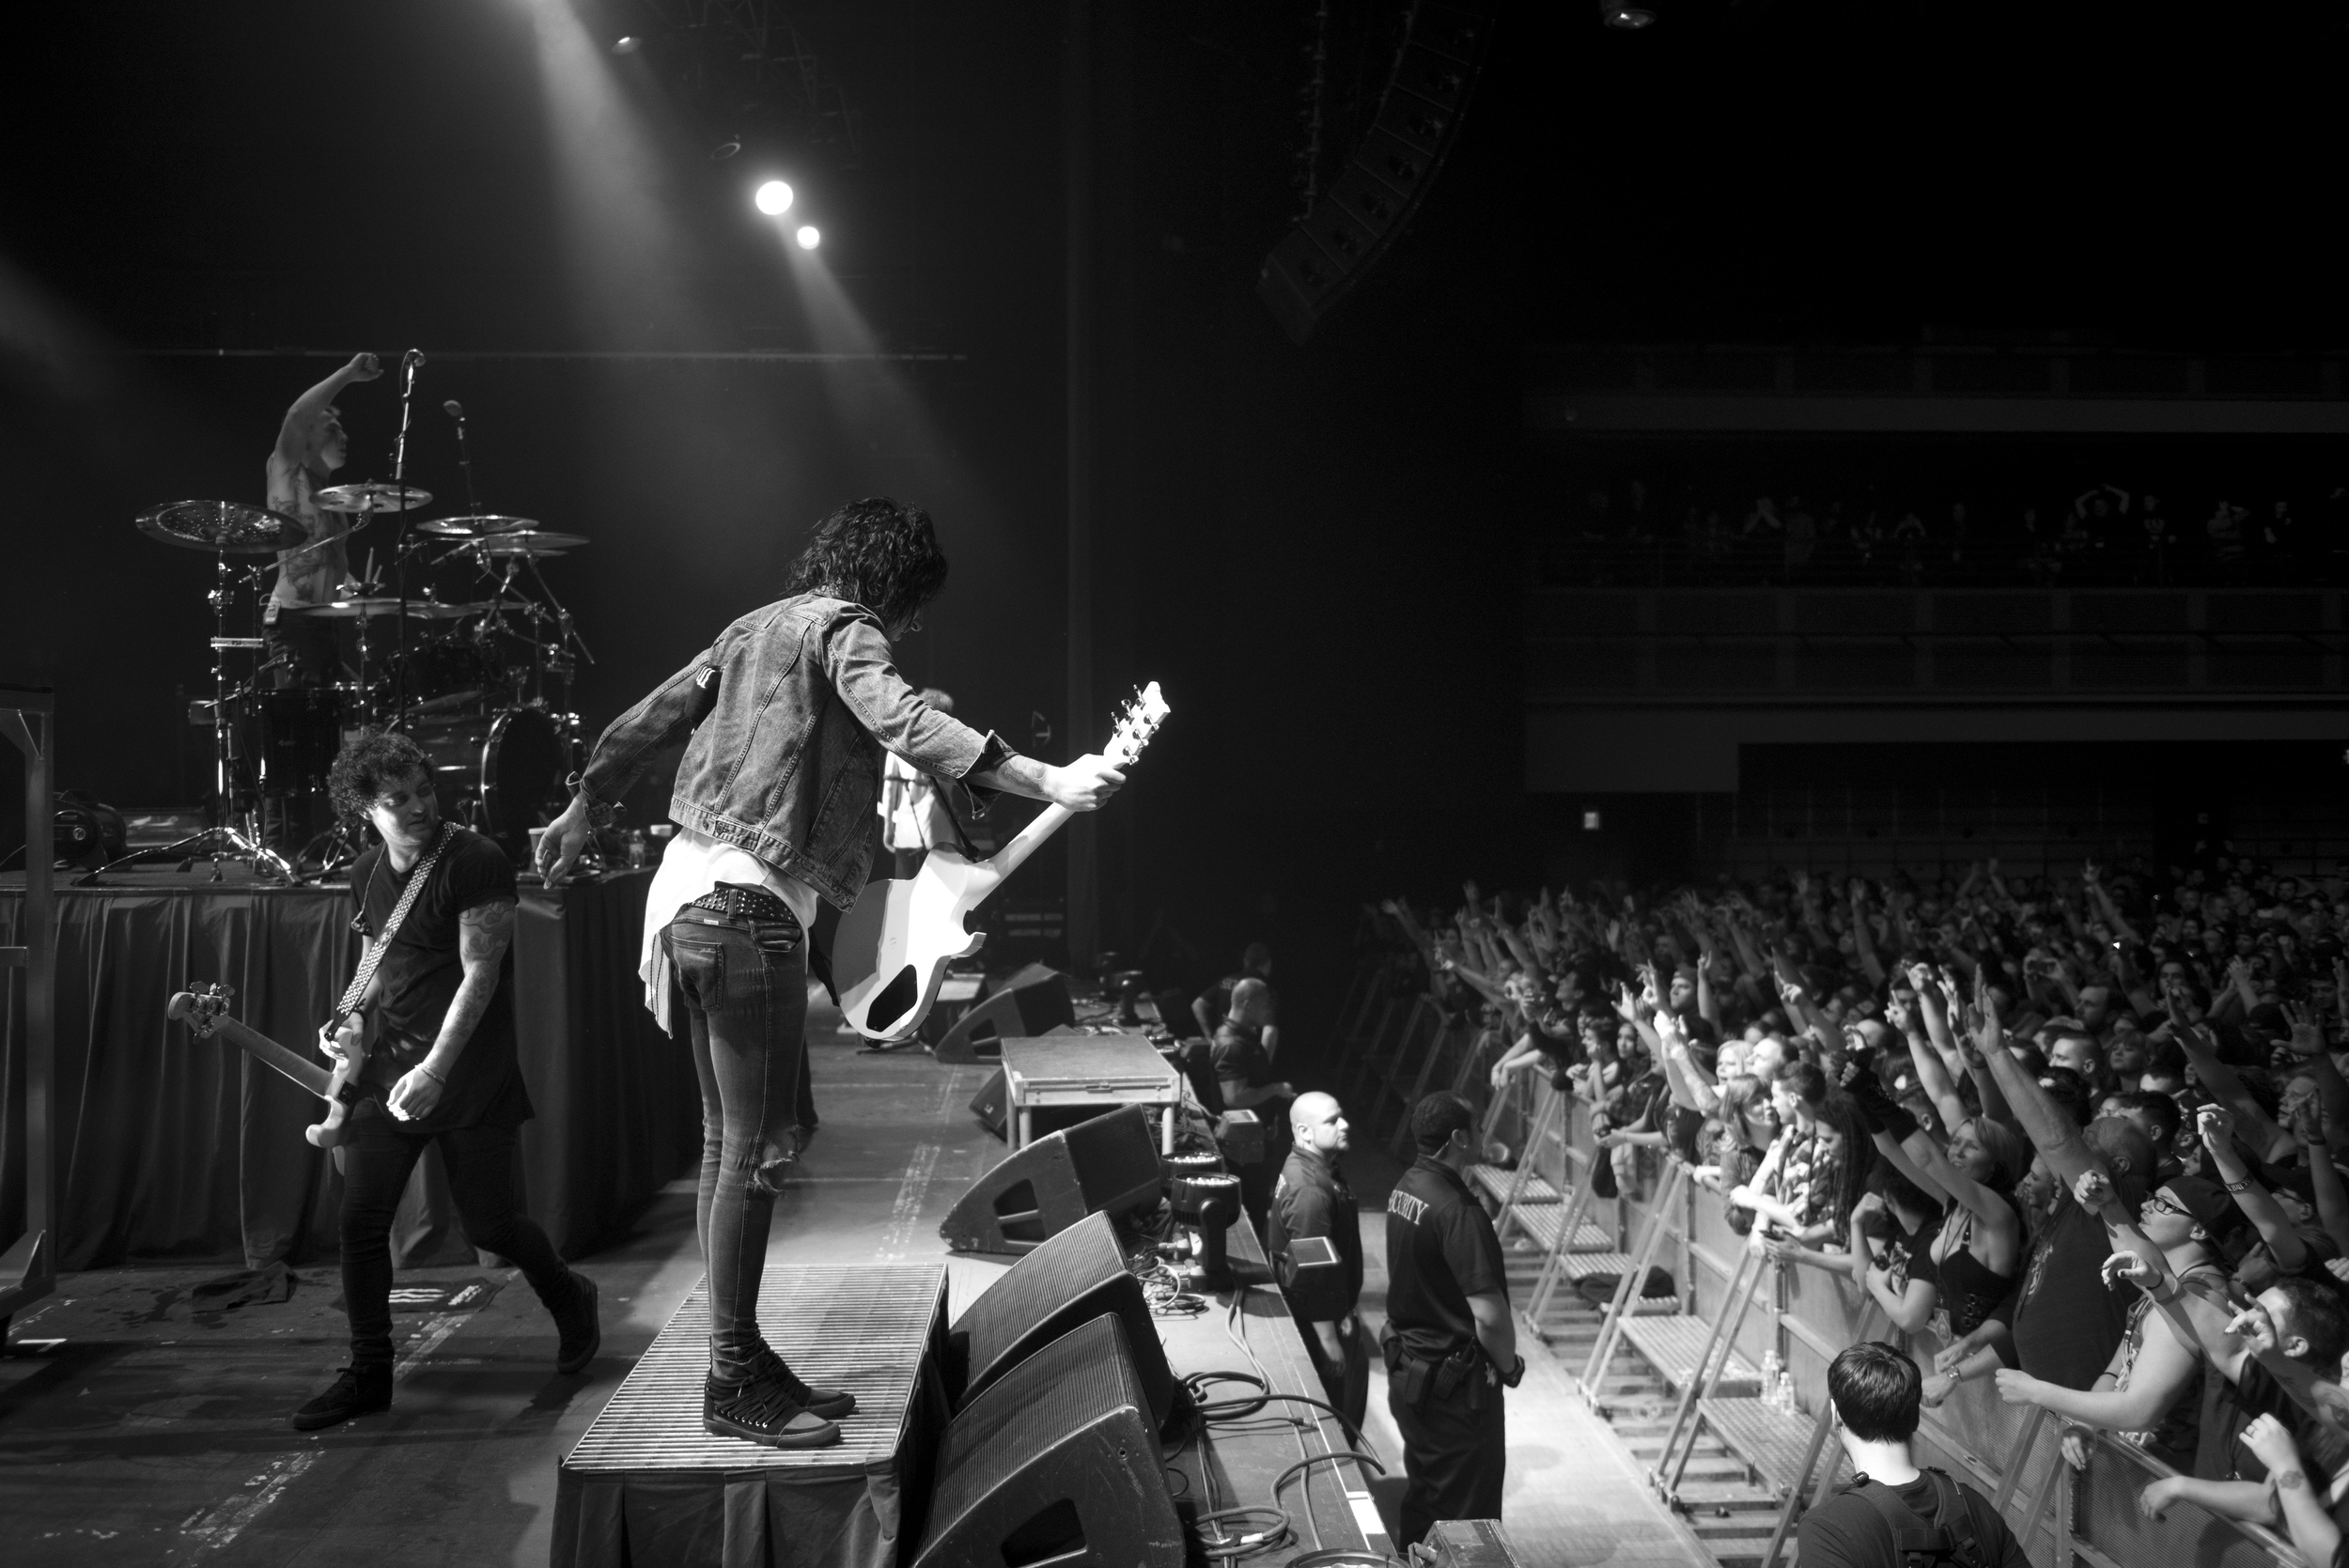 Asking Alexandria performs at The Joint at Hard Rock Hotel & Casino in Las Vegas Saturday, Feb. 6, 2016. Photo by Jason Ogulnik